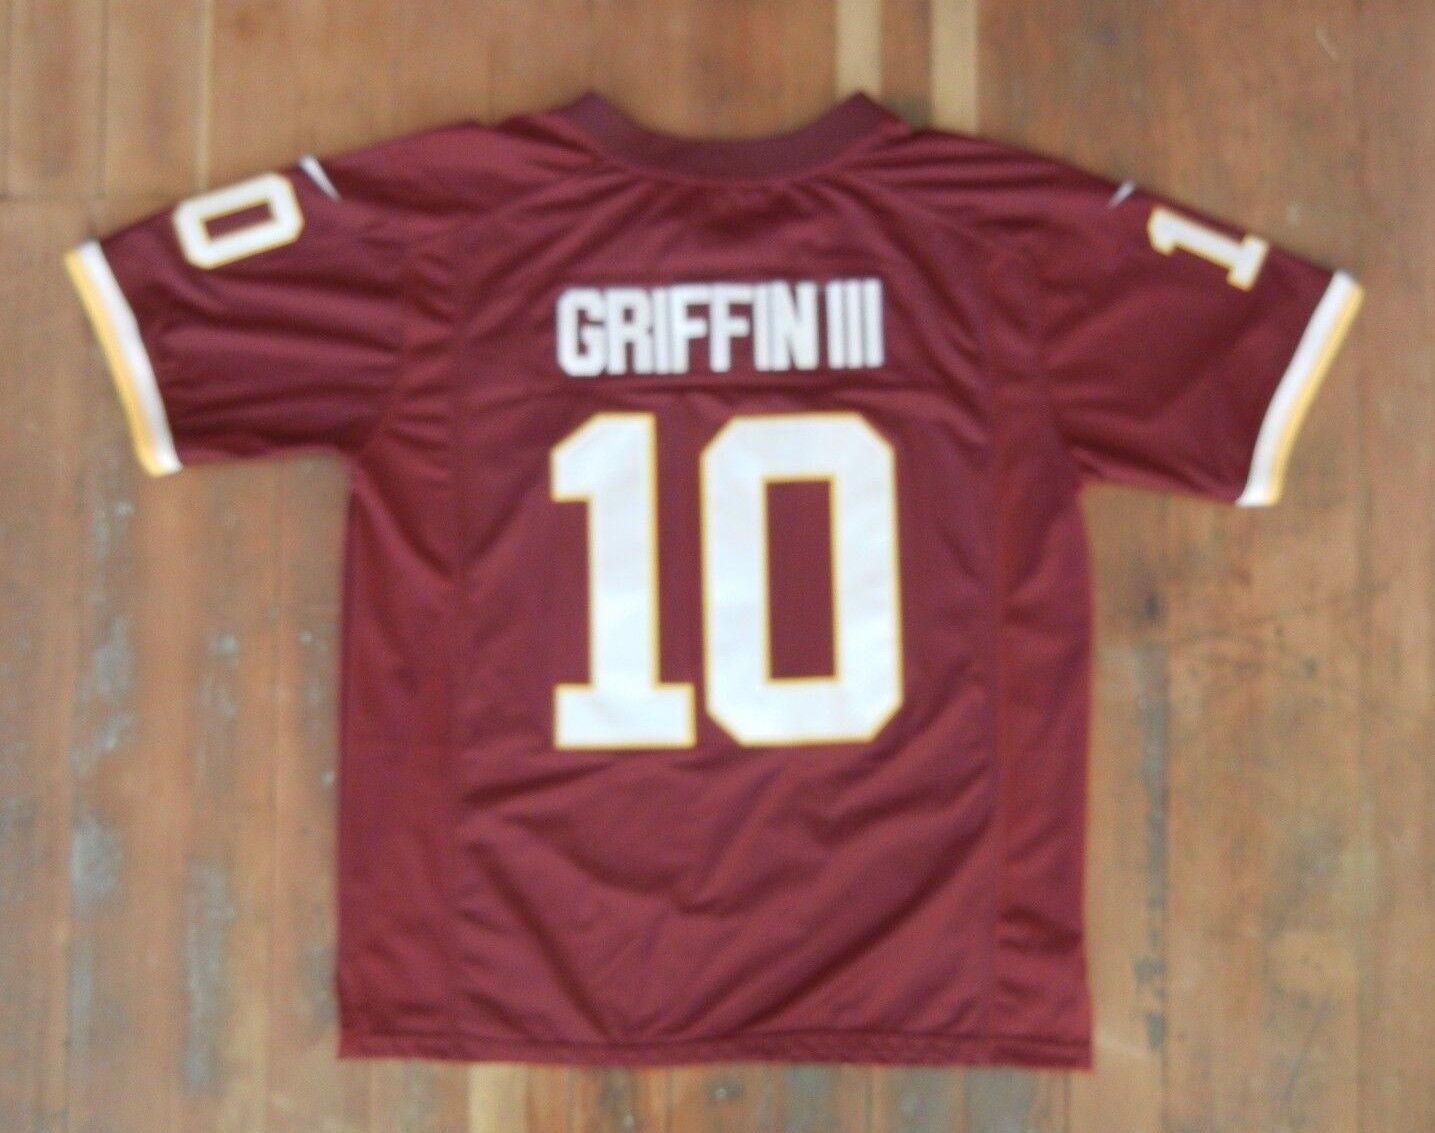 WASHINGTON REDSKINS Authentic Sewn Football RG3 ROBERT GRIFFIN III JERSEY Sz XL